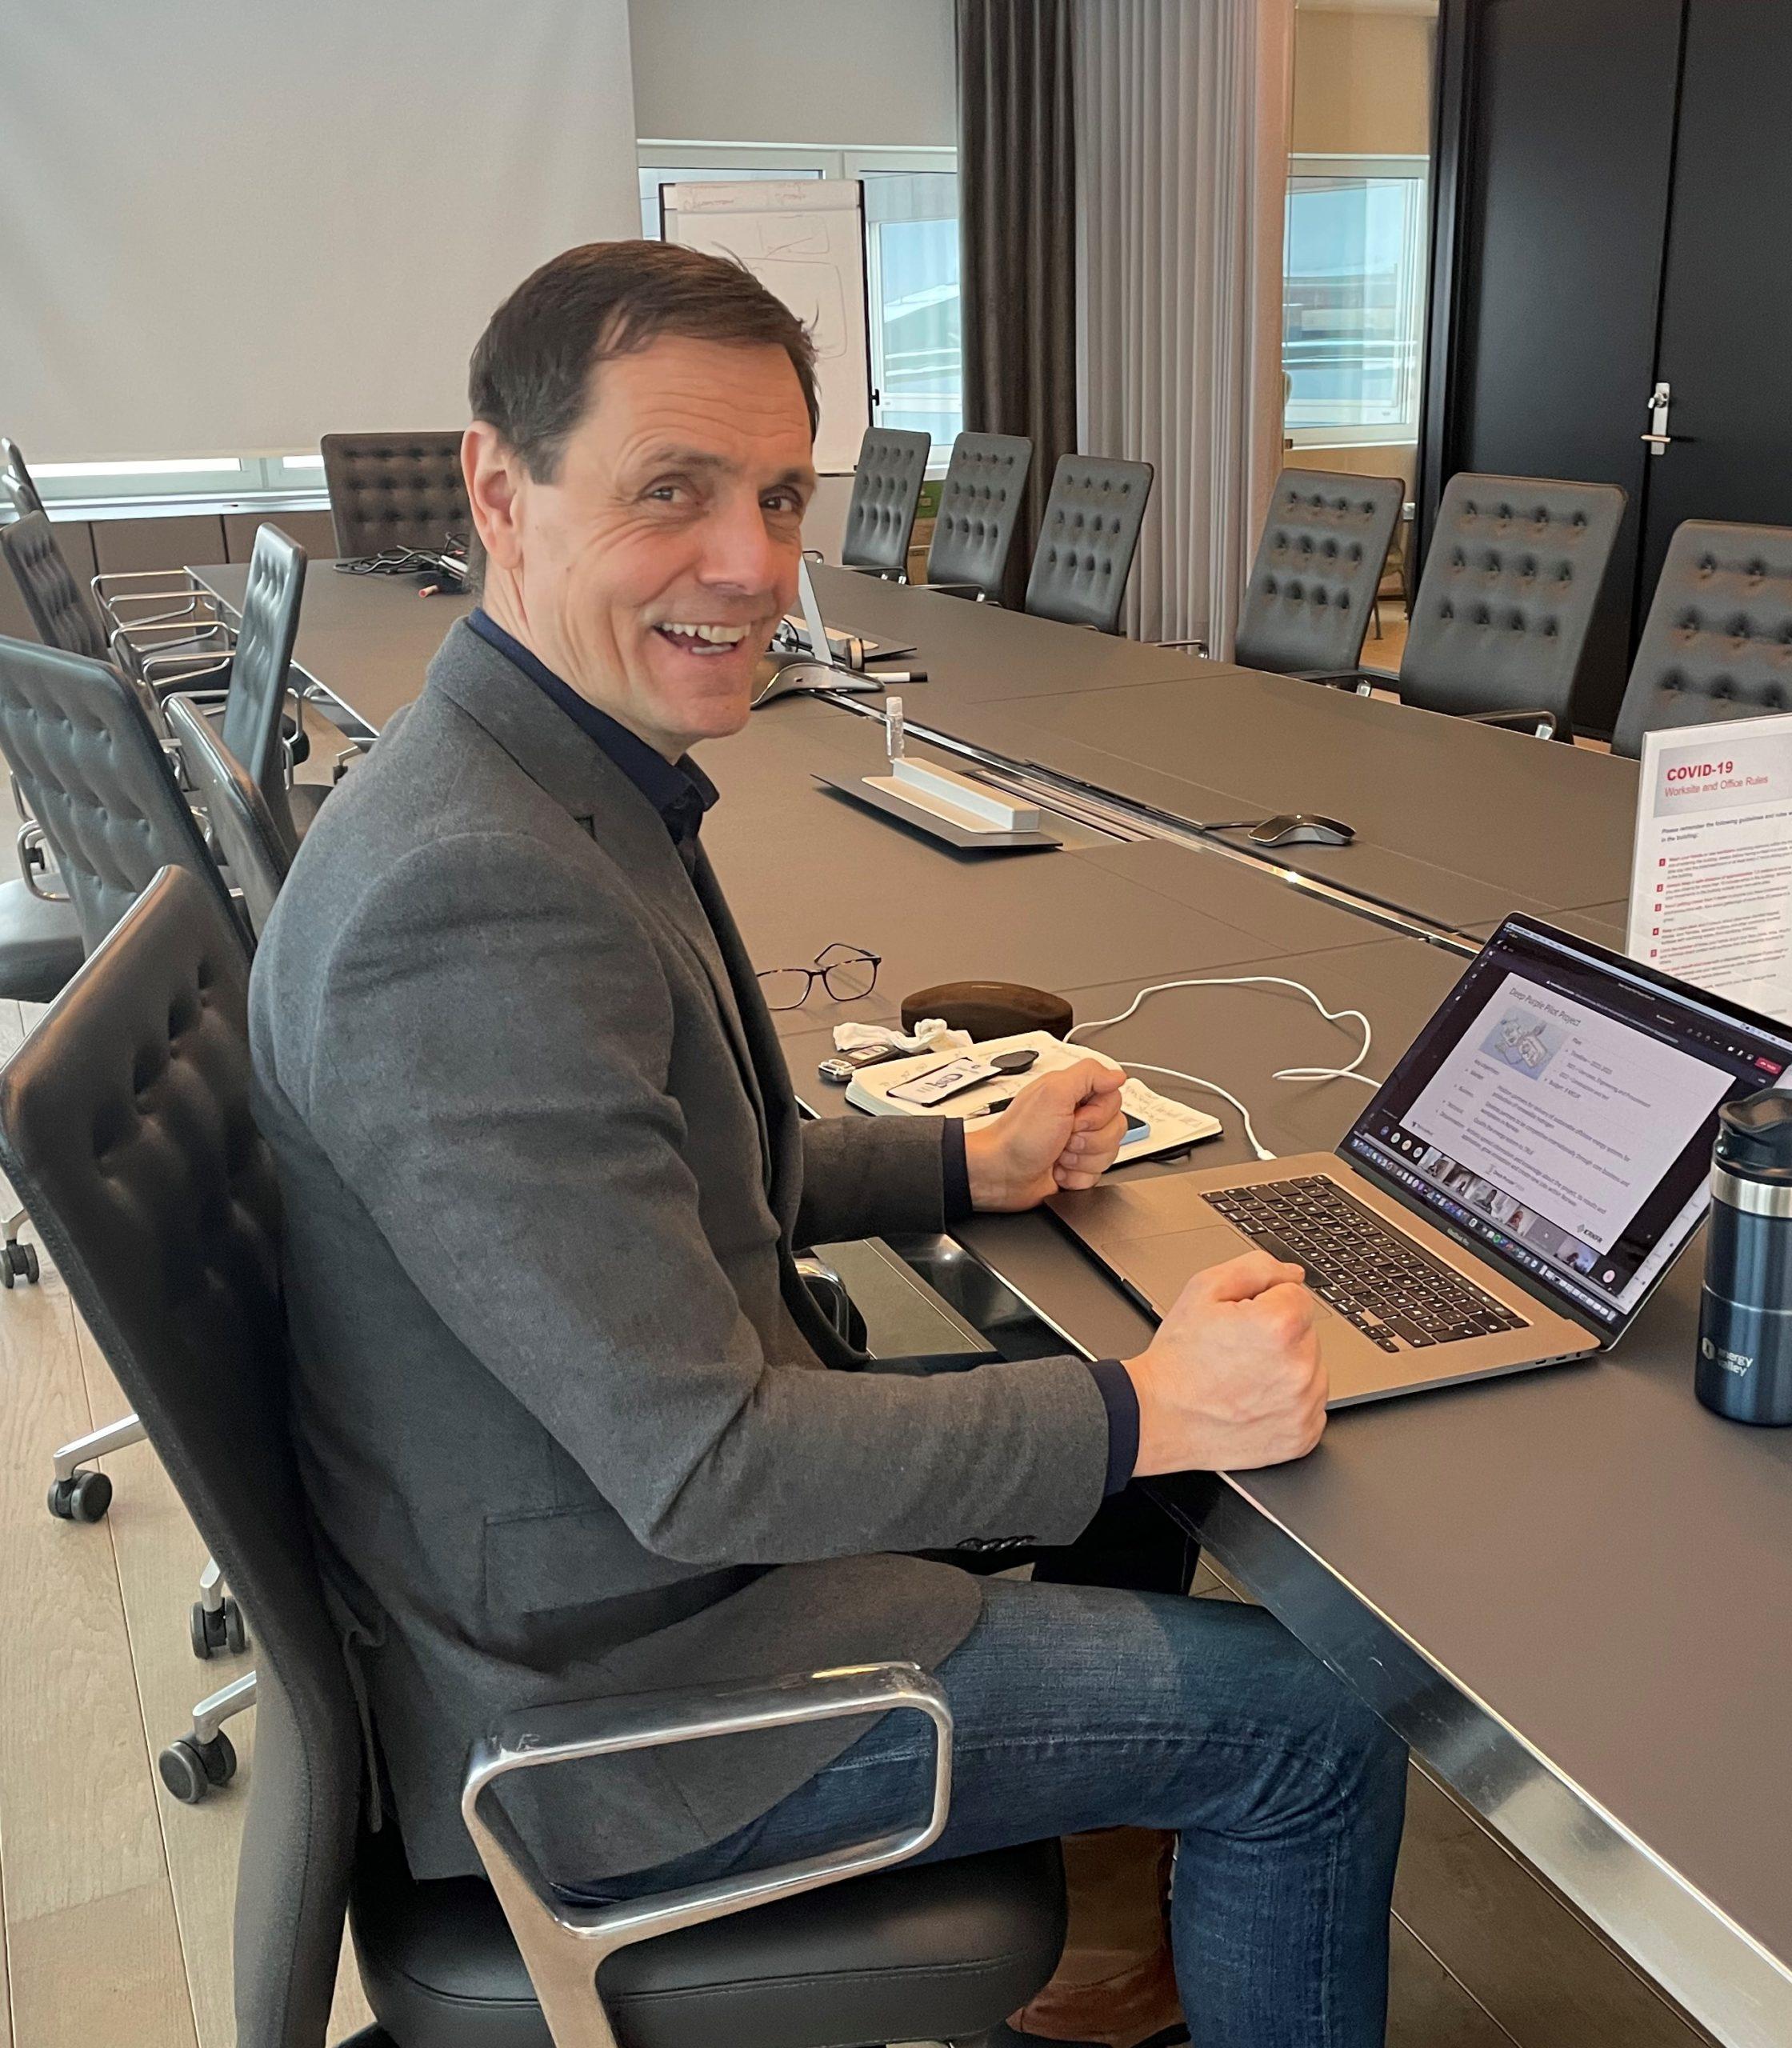 Preben Strøm, Managing Director of Energy Valley